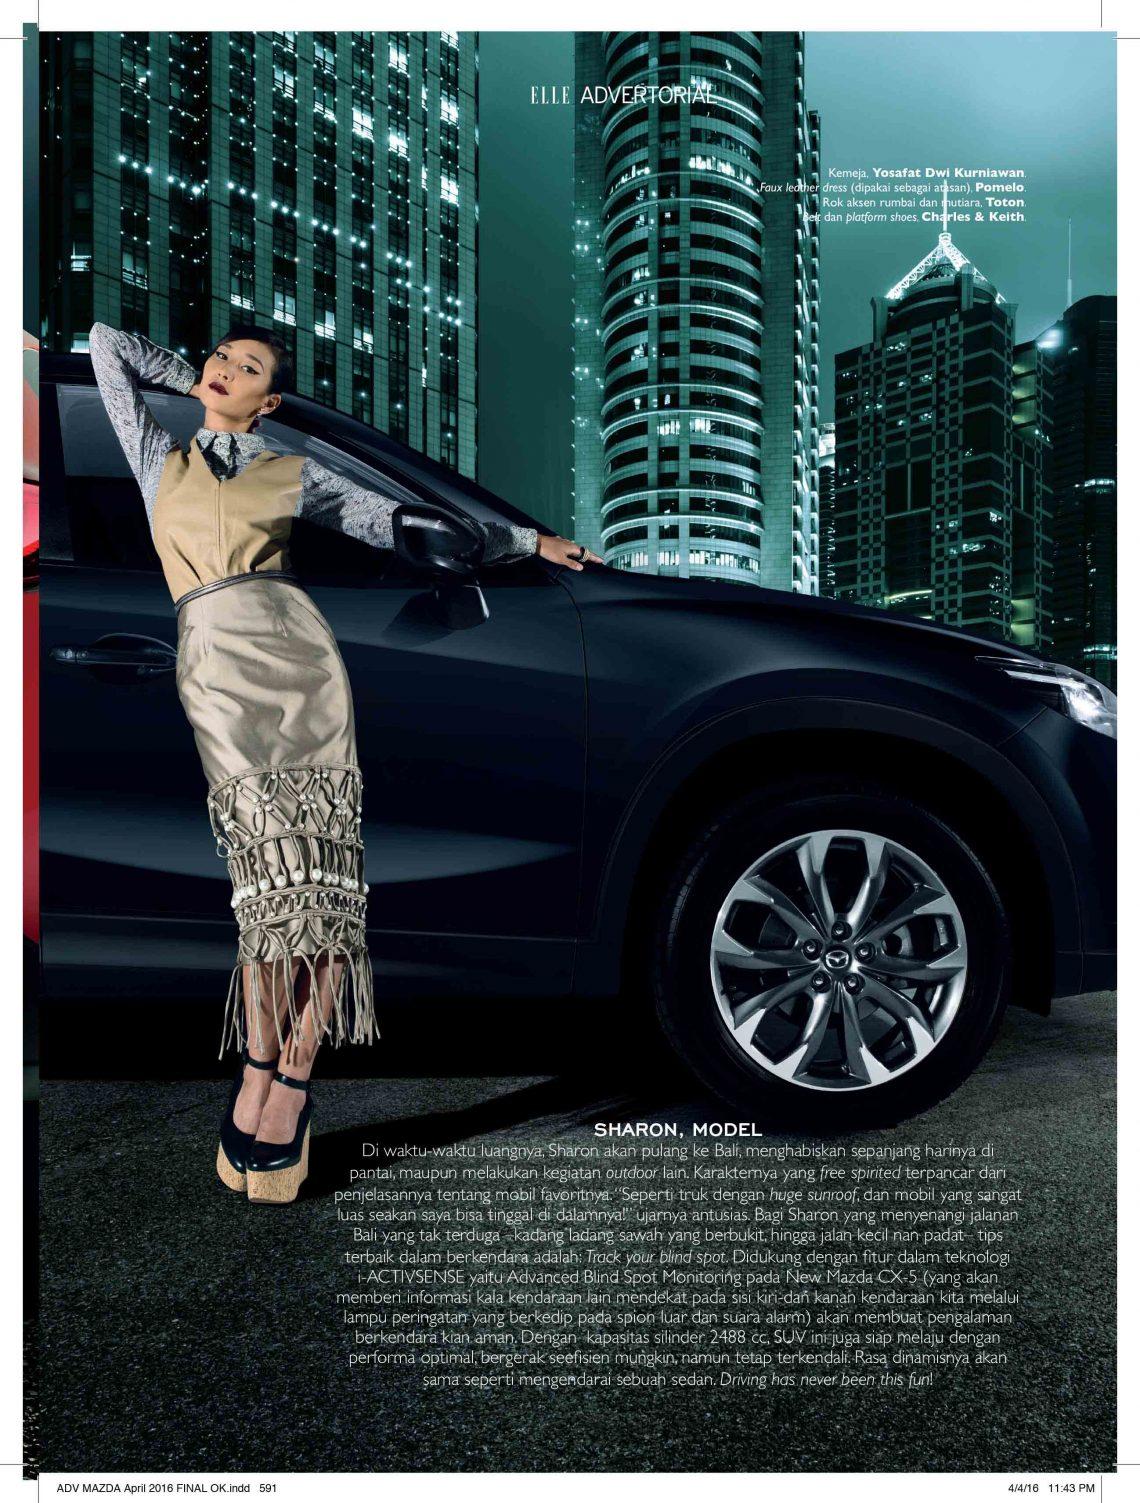 Balistarz-model-Sharon-Coplon-portrait-shoot-for-Elle-advertorial